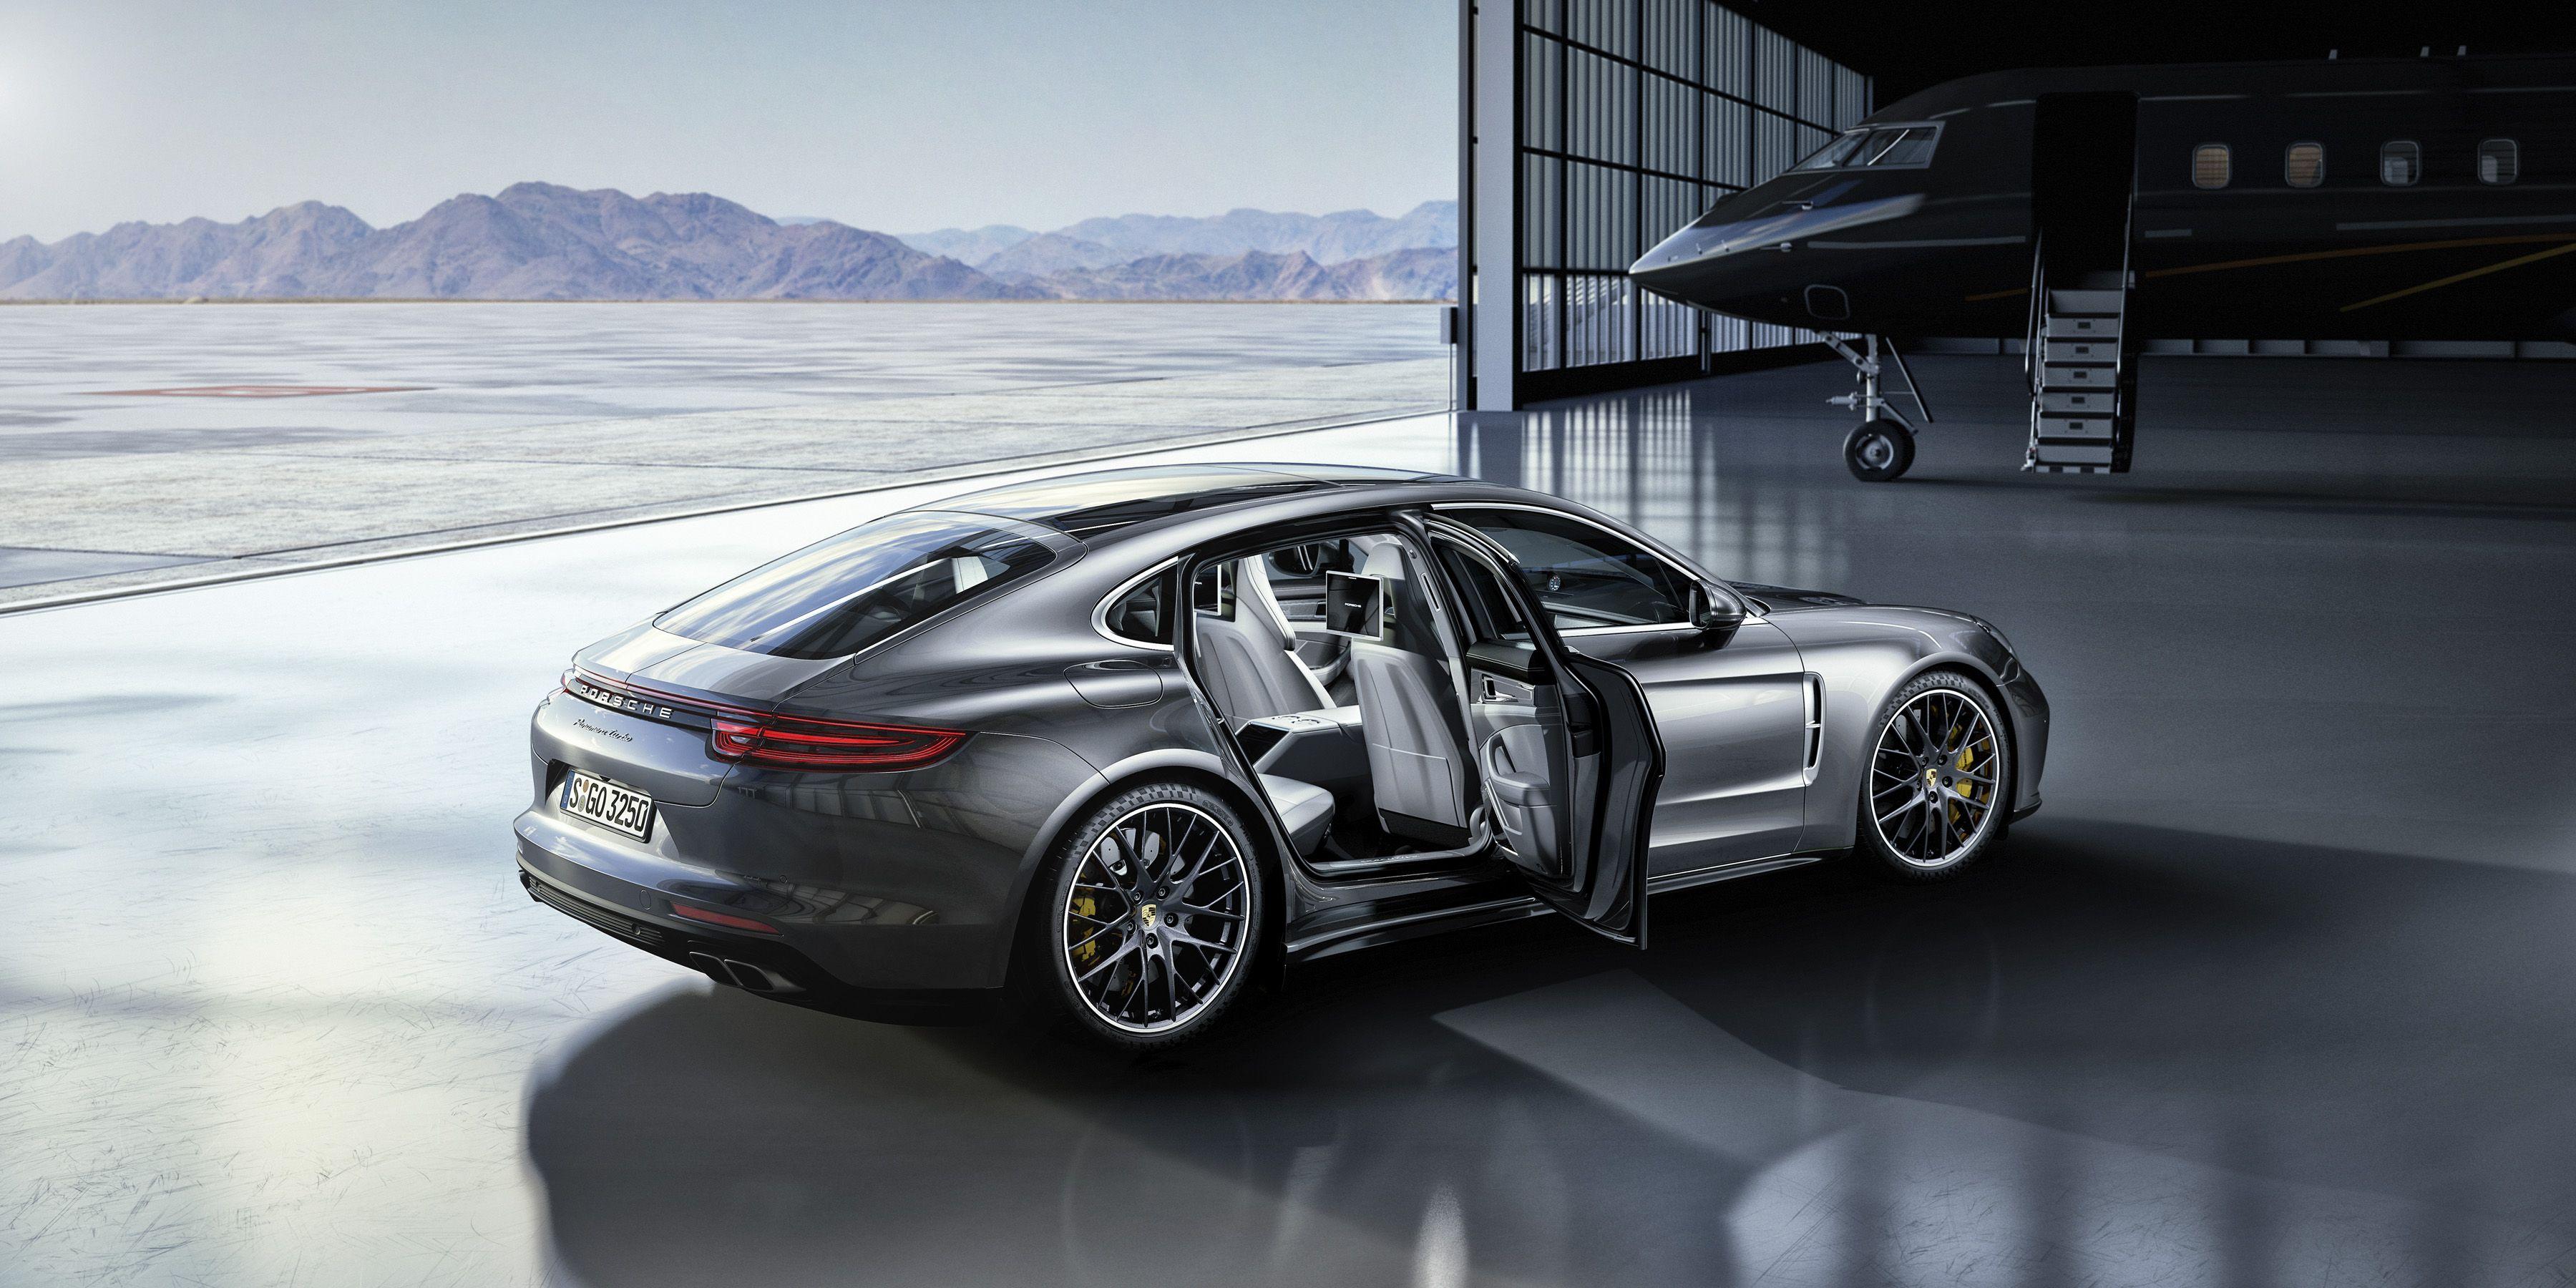 Rose Glen North Dakota ⁓ Try These Top Ten Luxury Car Brands